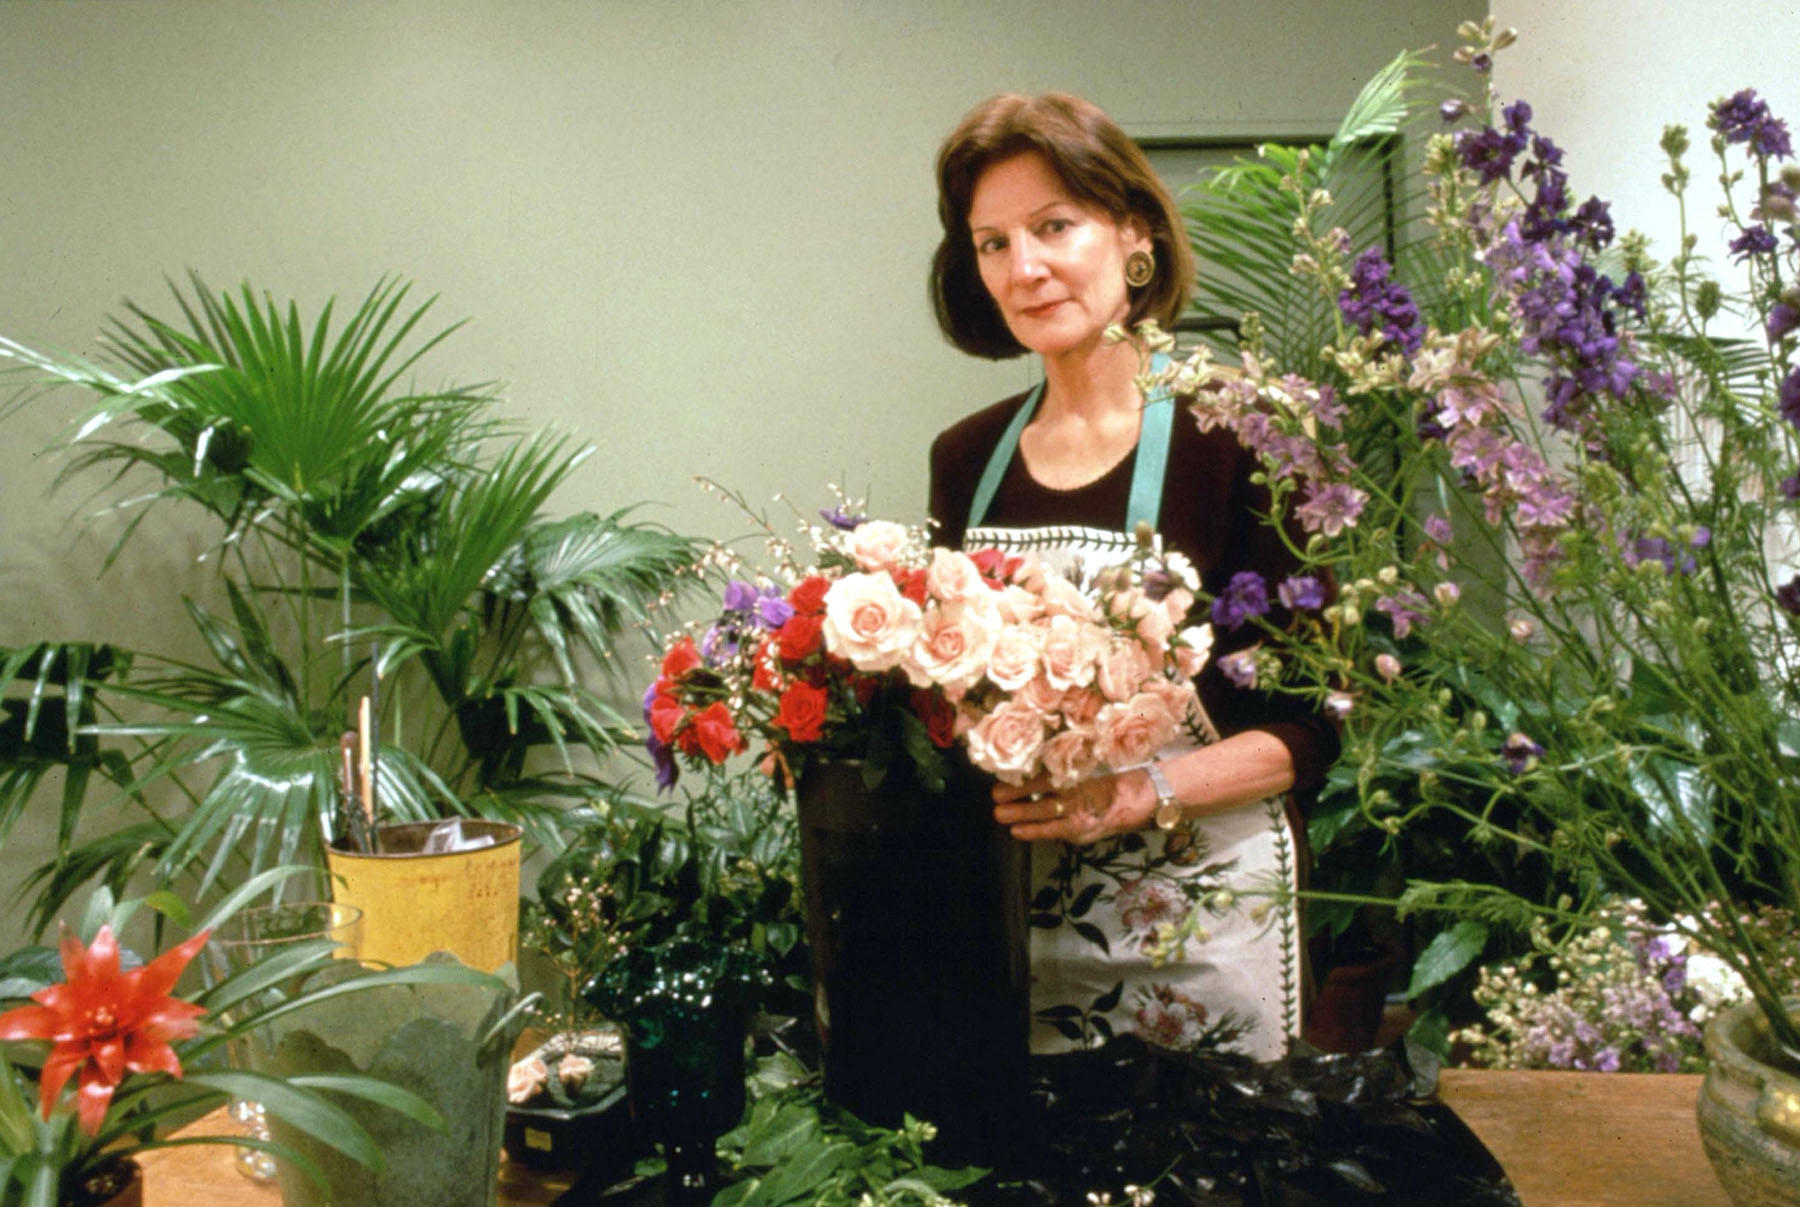 Host Jeanne Stanton